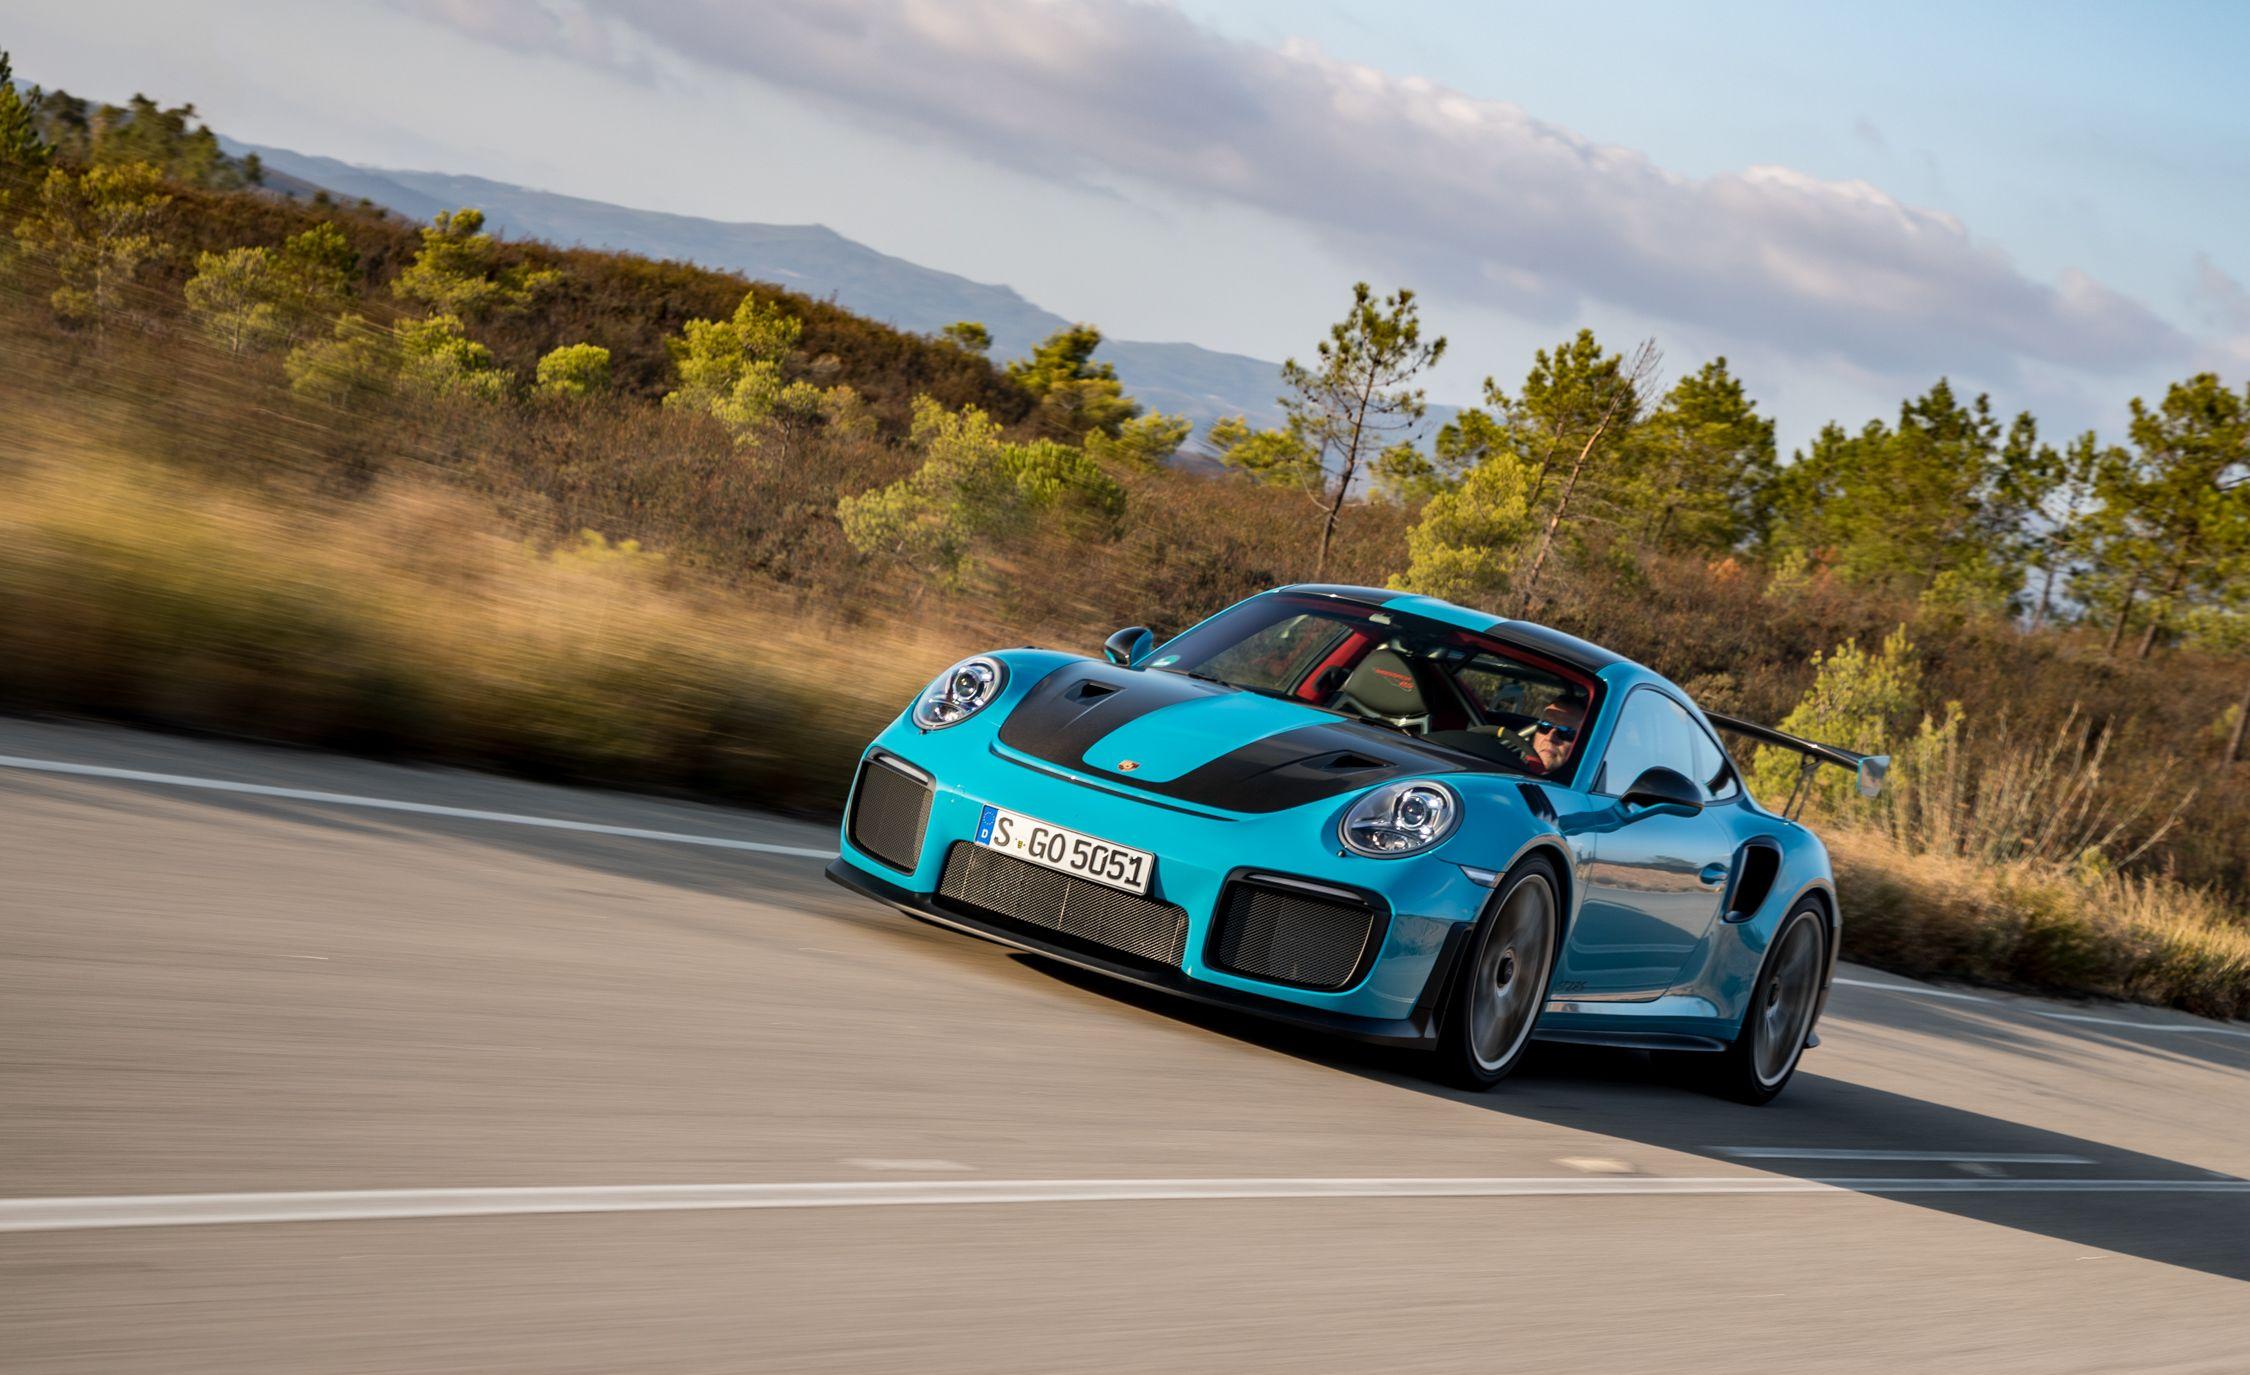 2018-PORSCHE-911-GT2-RS-102 Wonderful Porsche 911 Gt2 Rs Review Cars Trend